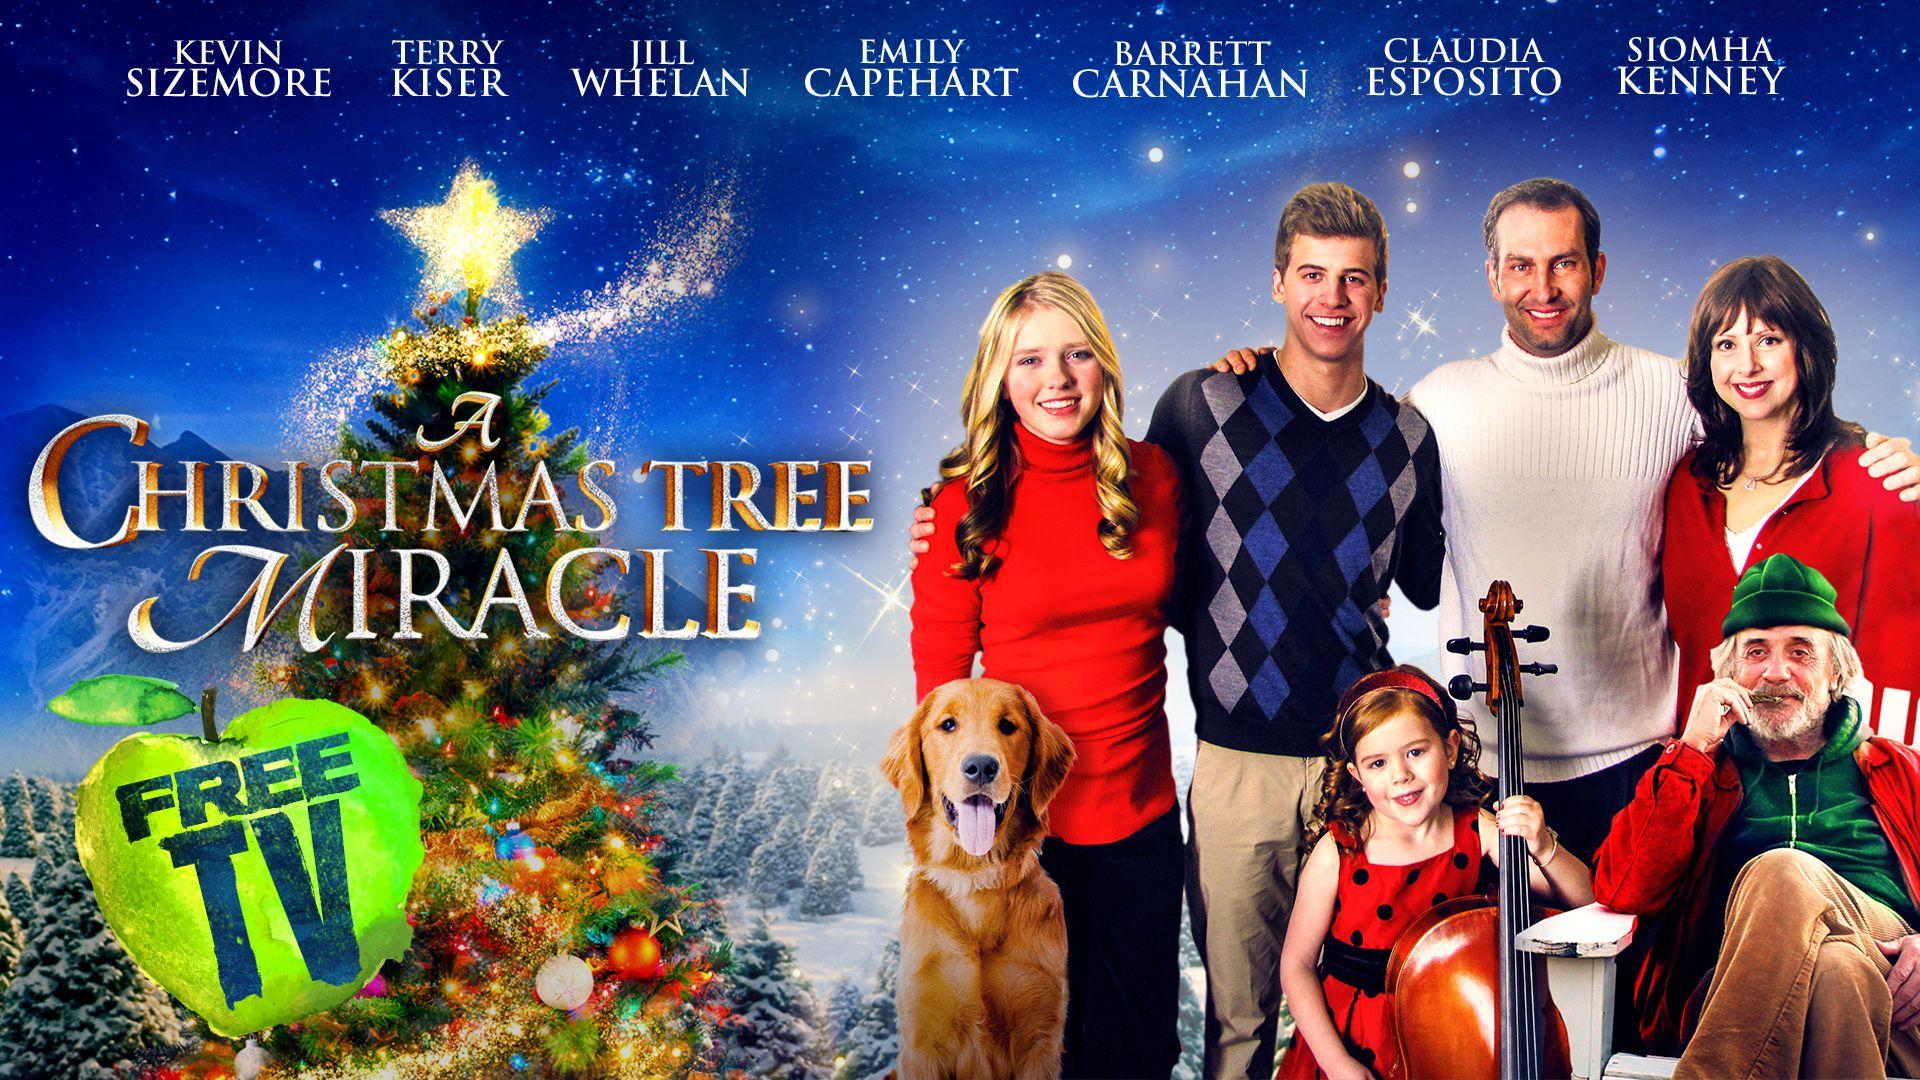 2013 TVG 102 min Drama, Family Cast Kevin Sizemore